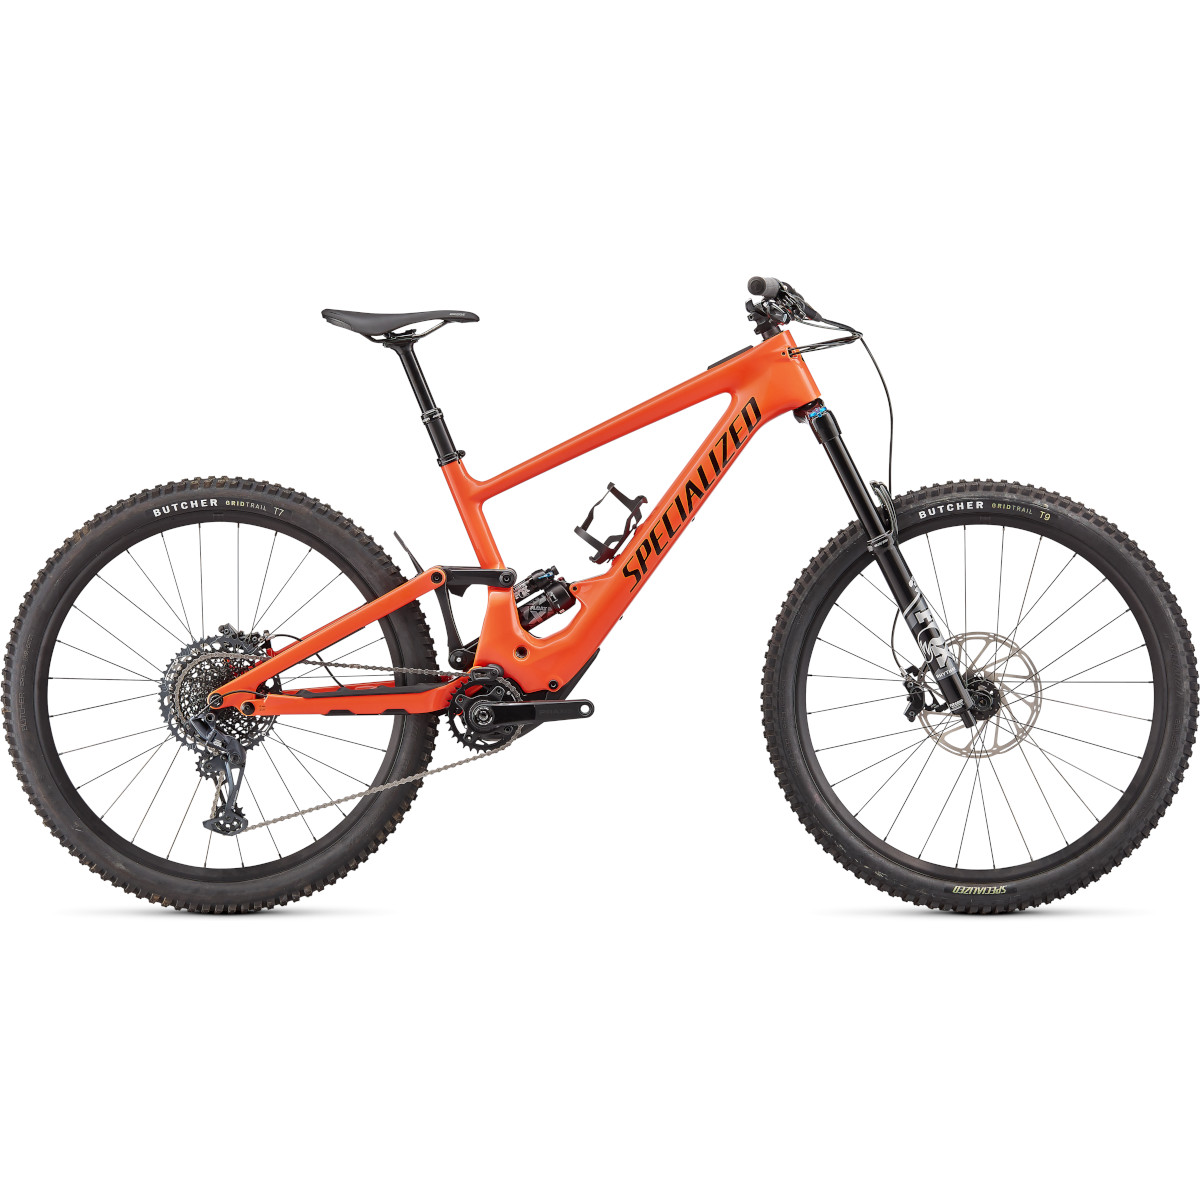 "Produktbild von Specialized TURBO KENEVO SL COMP - 29"" Carbon MTB E-Bike - 2022 - gloss blaze / black"